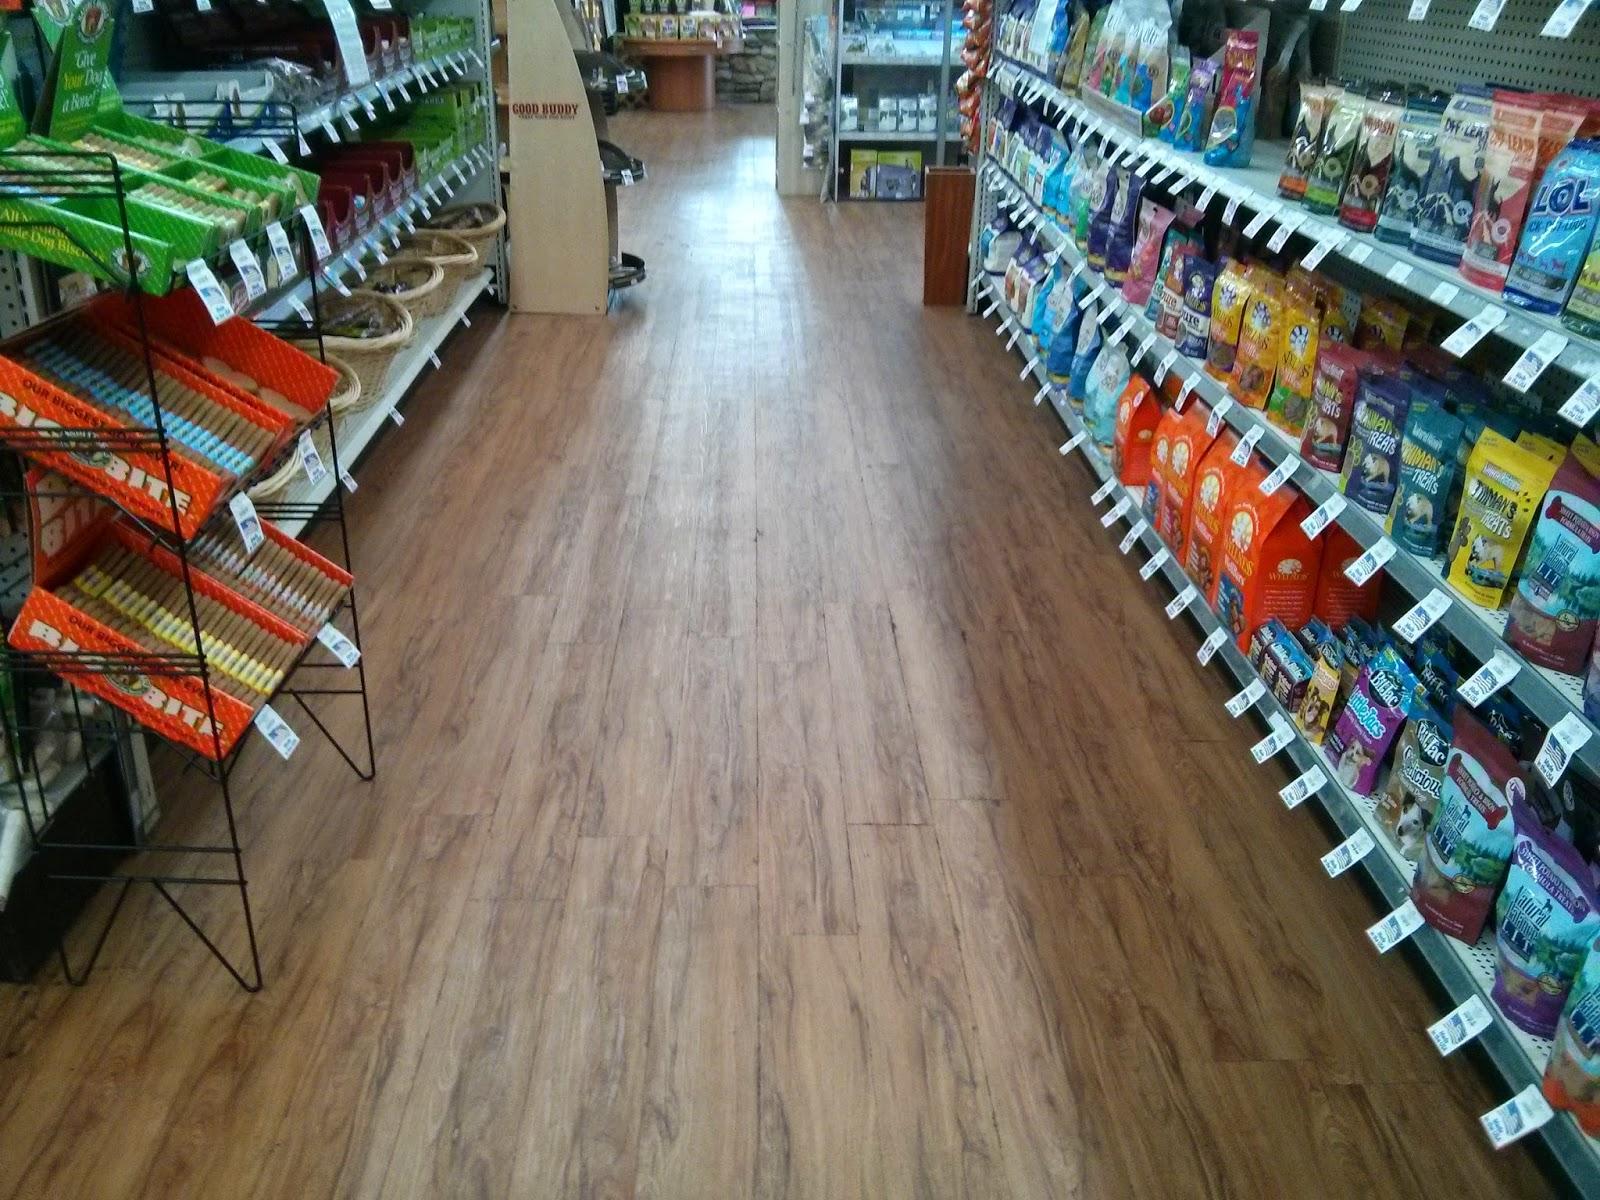 Floor Installation Photos Congoleum Endurance Installed At Pets Plus - Congoleum retailers